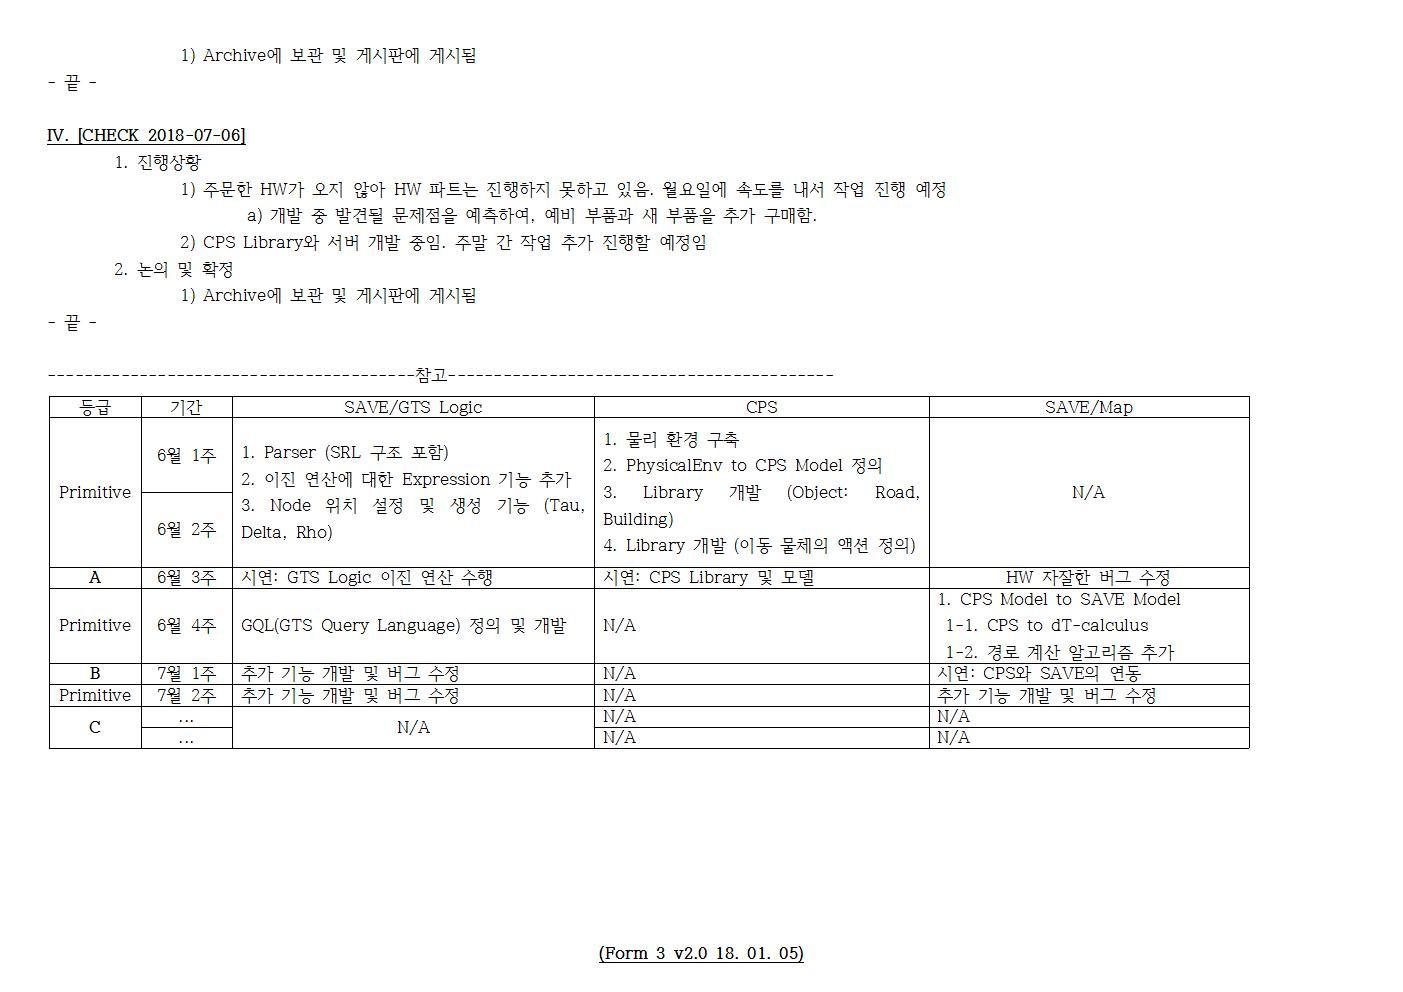 D-[18-037-RC-07]-[3L-CPS]-[2018-07-06][SH]003.jpg